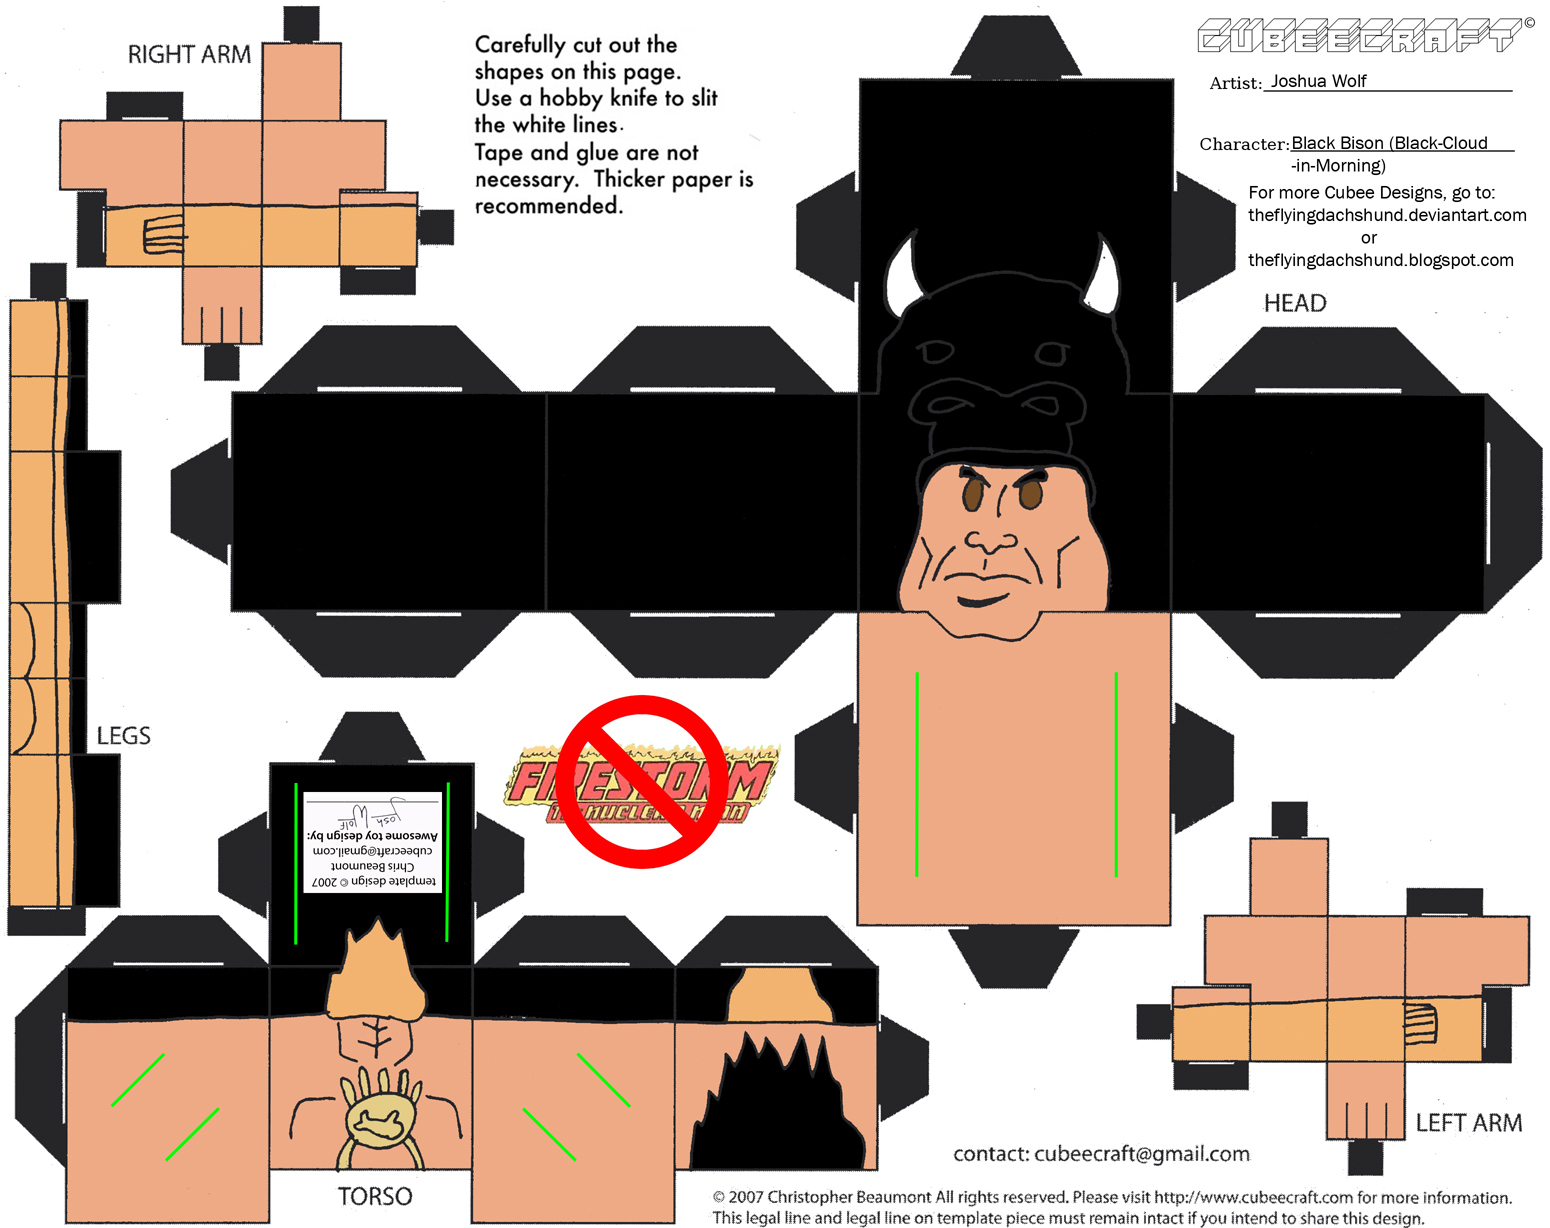 Vil21: Black Bison Cubee